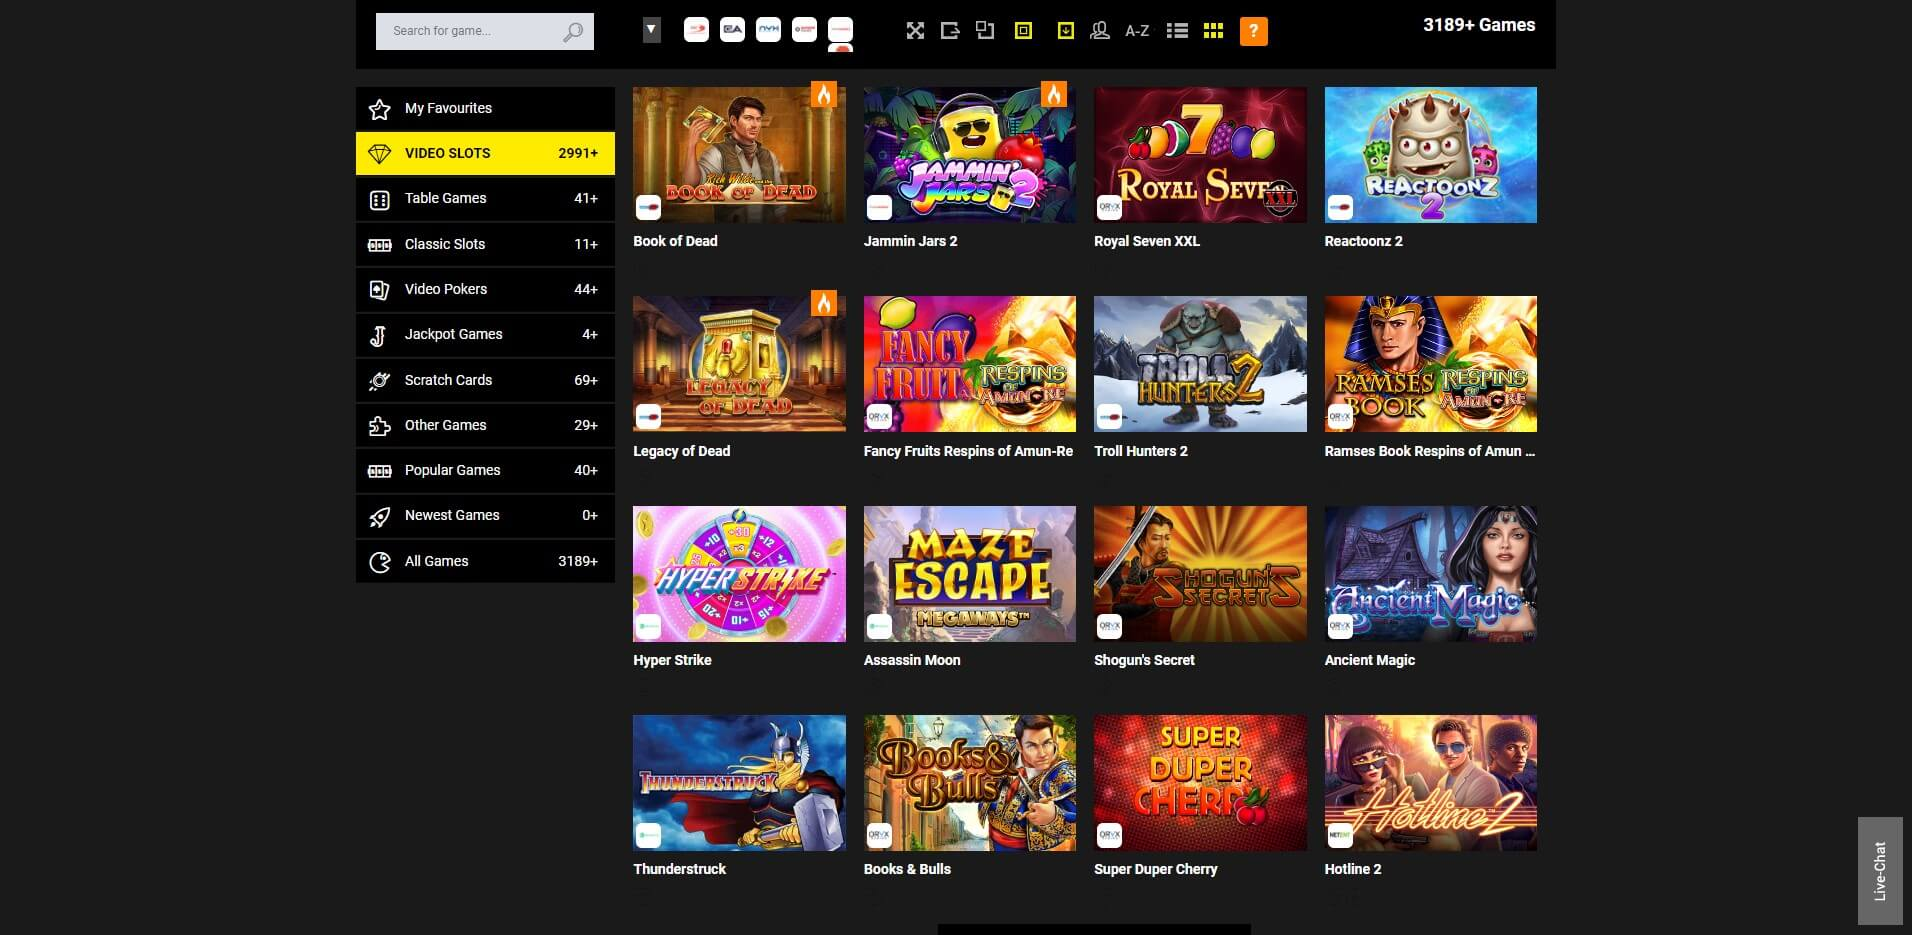 Games at Stake7 Casino